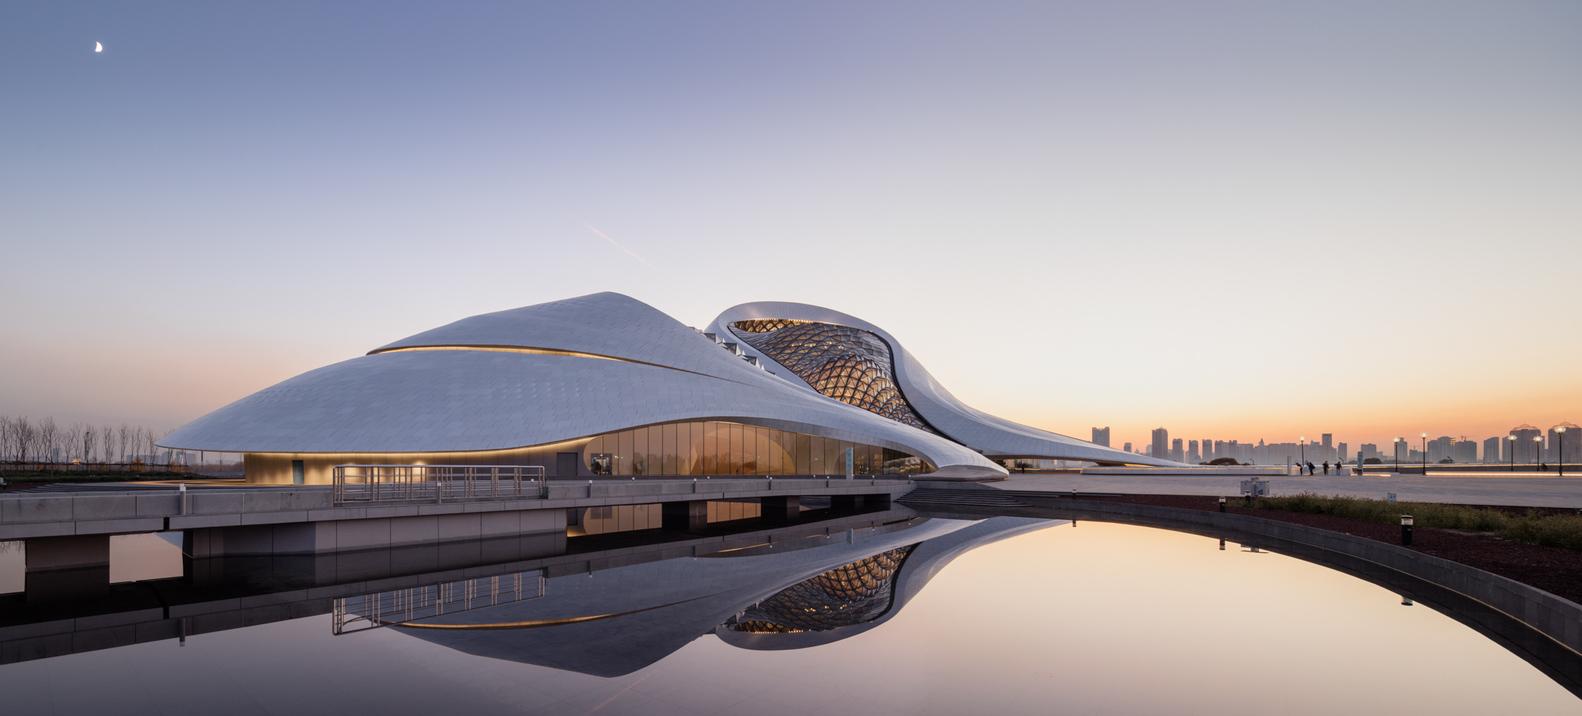 MAD_Harbin_Opera_House_002_©Adam_Mork